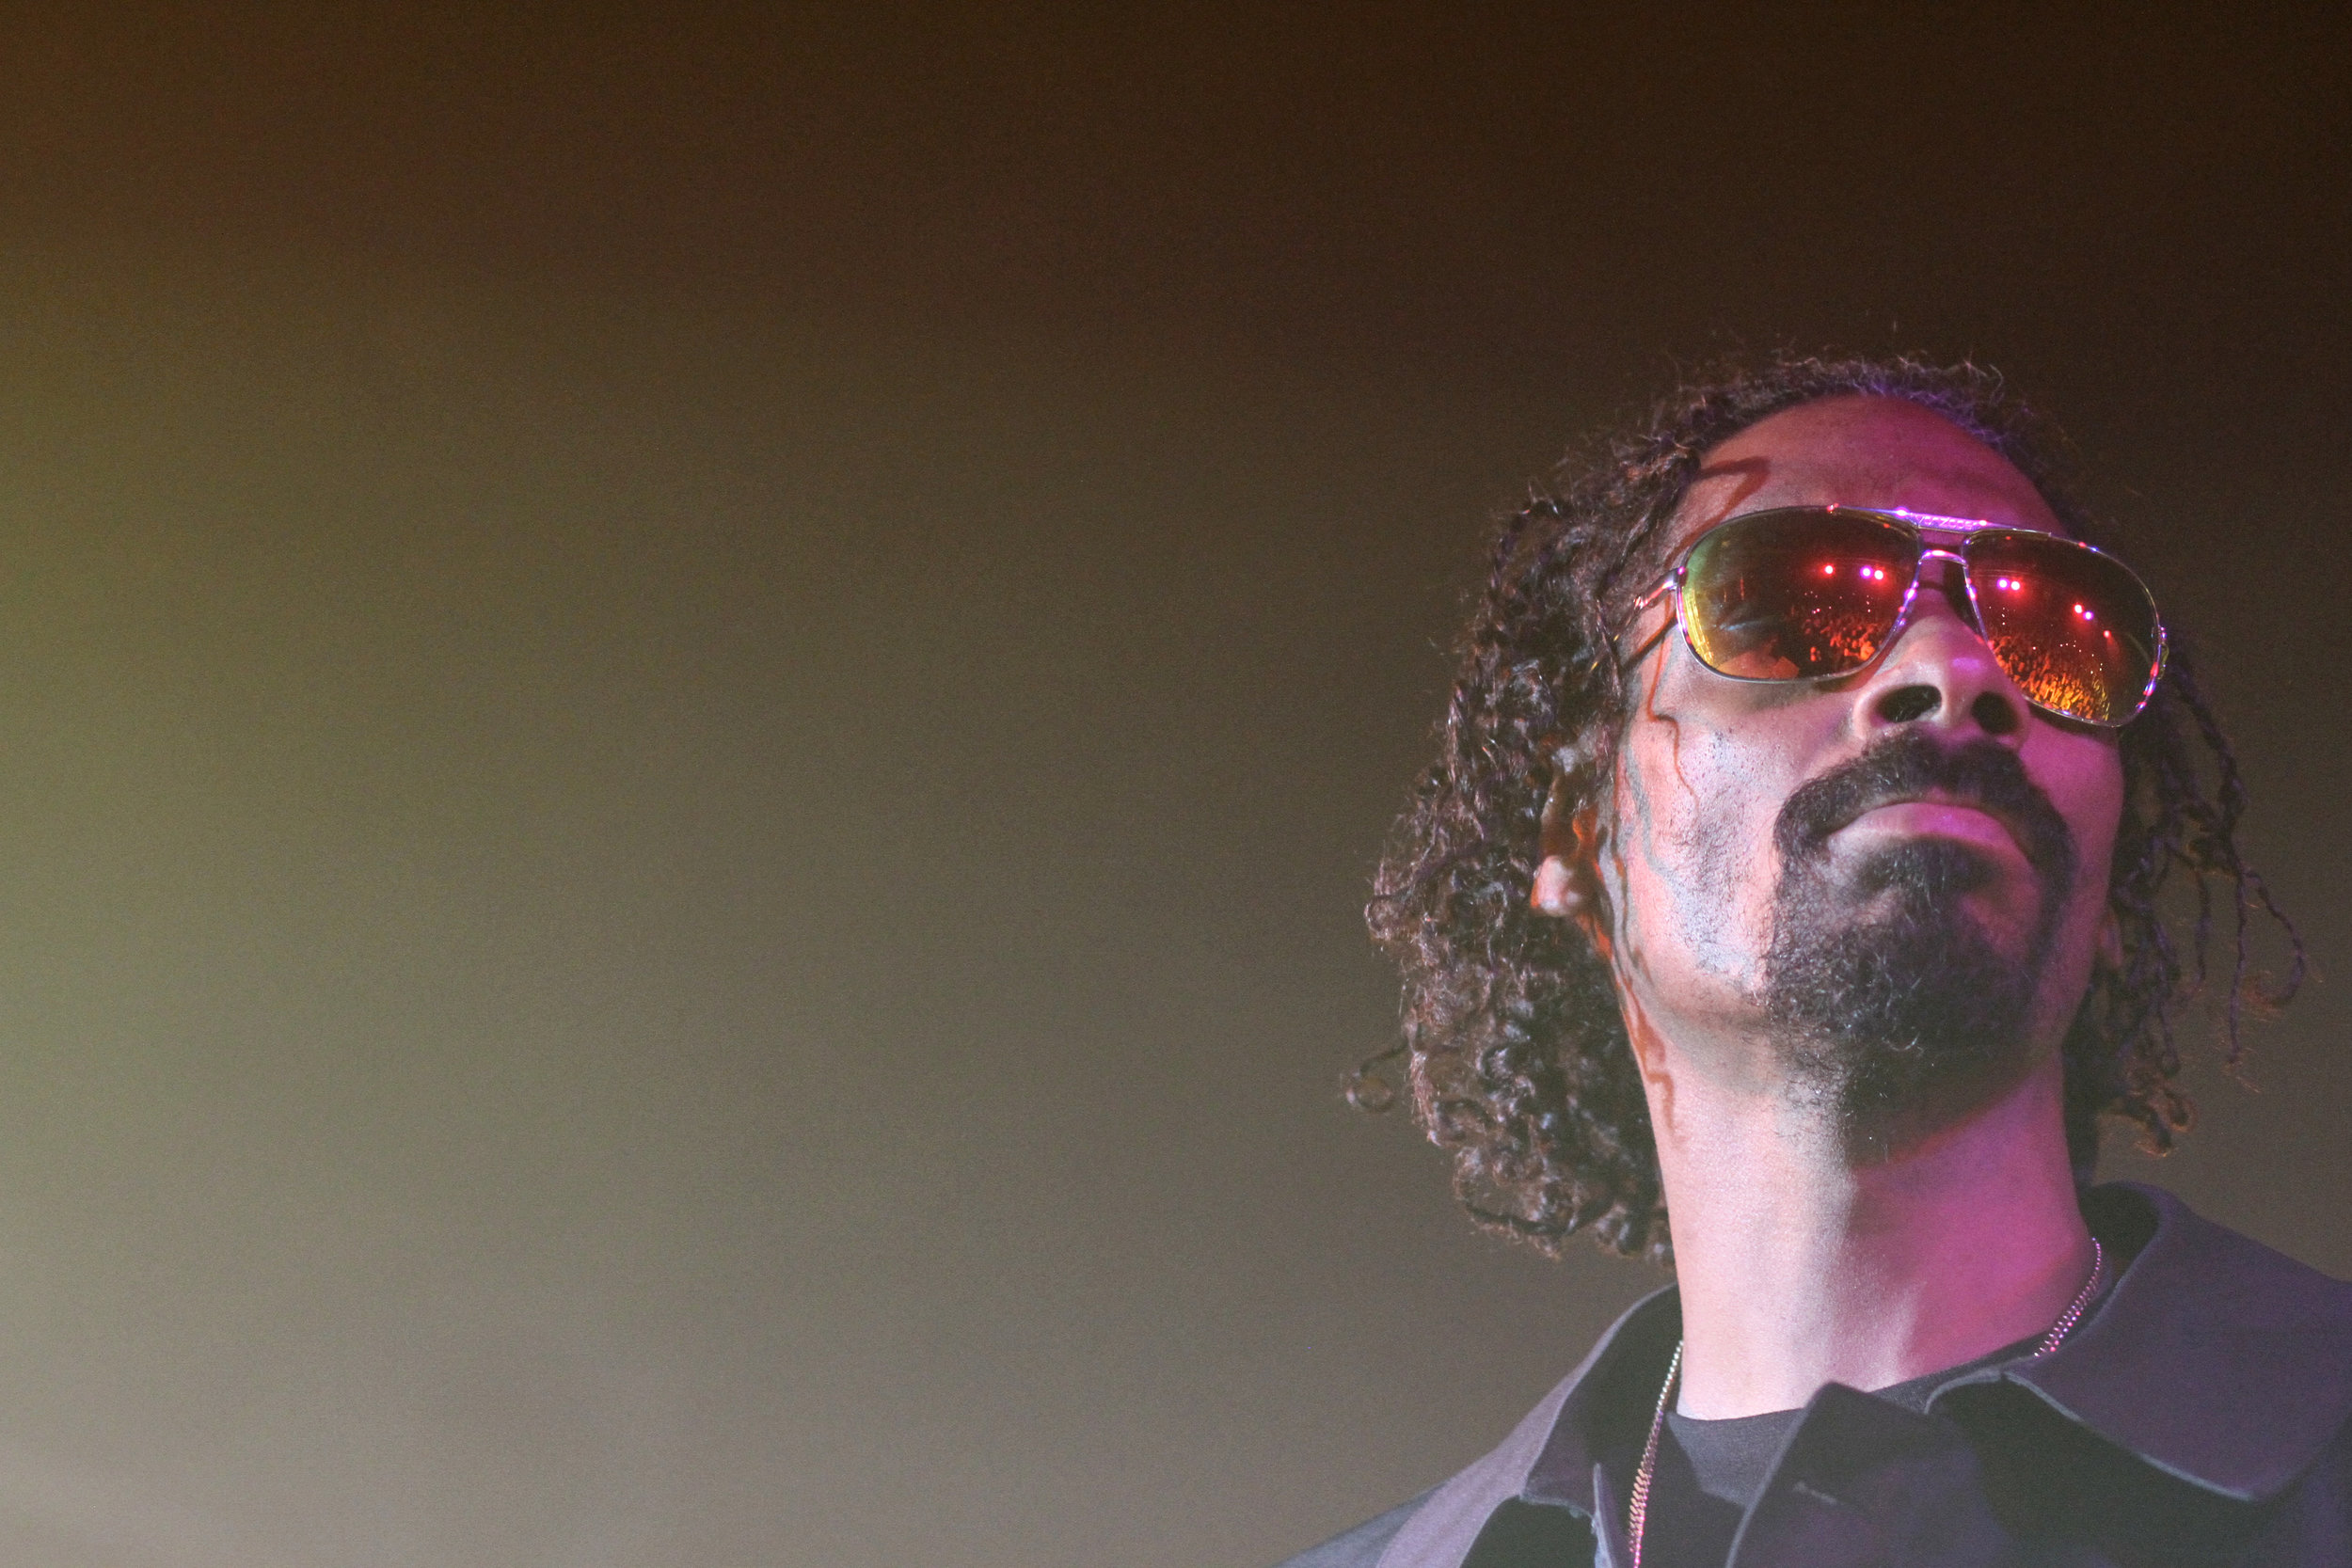 Snoop Dogg - 2012